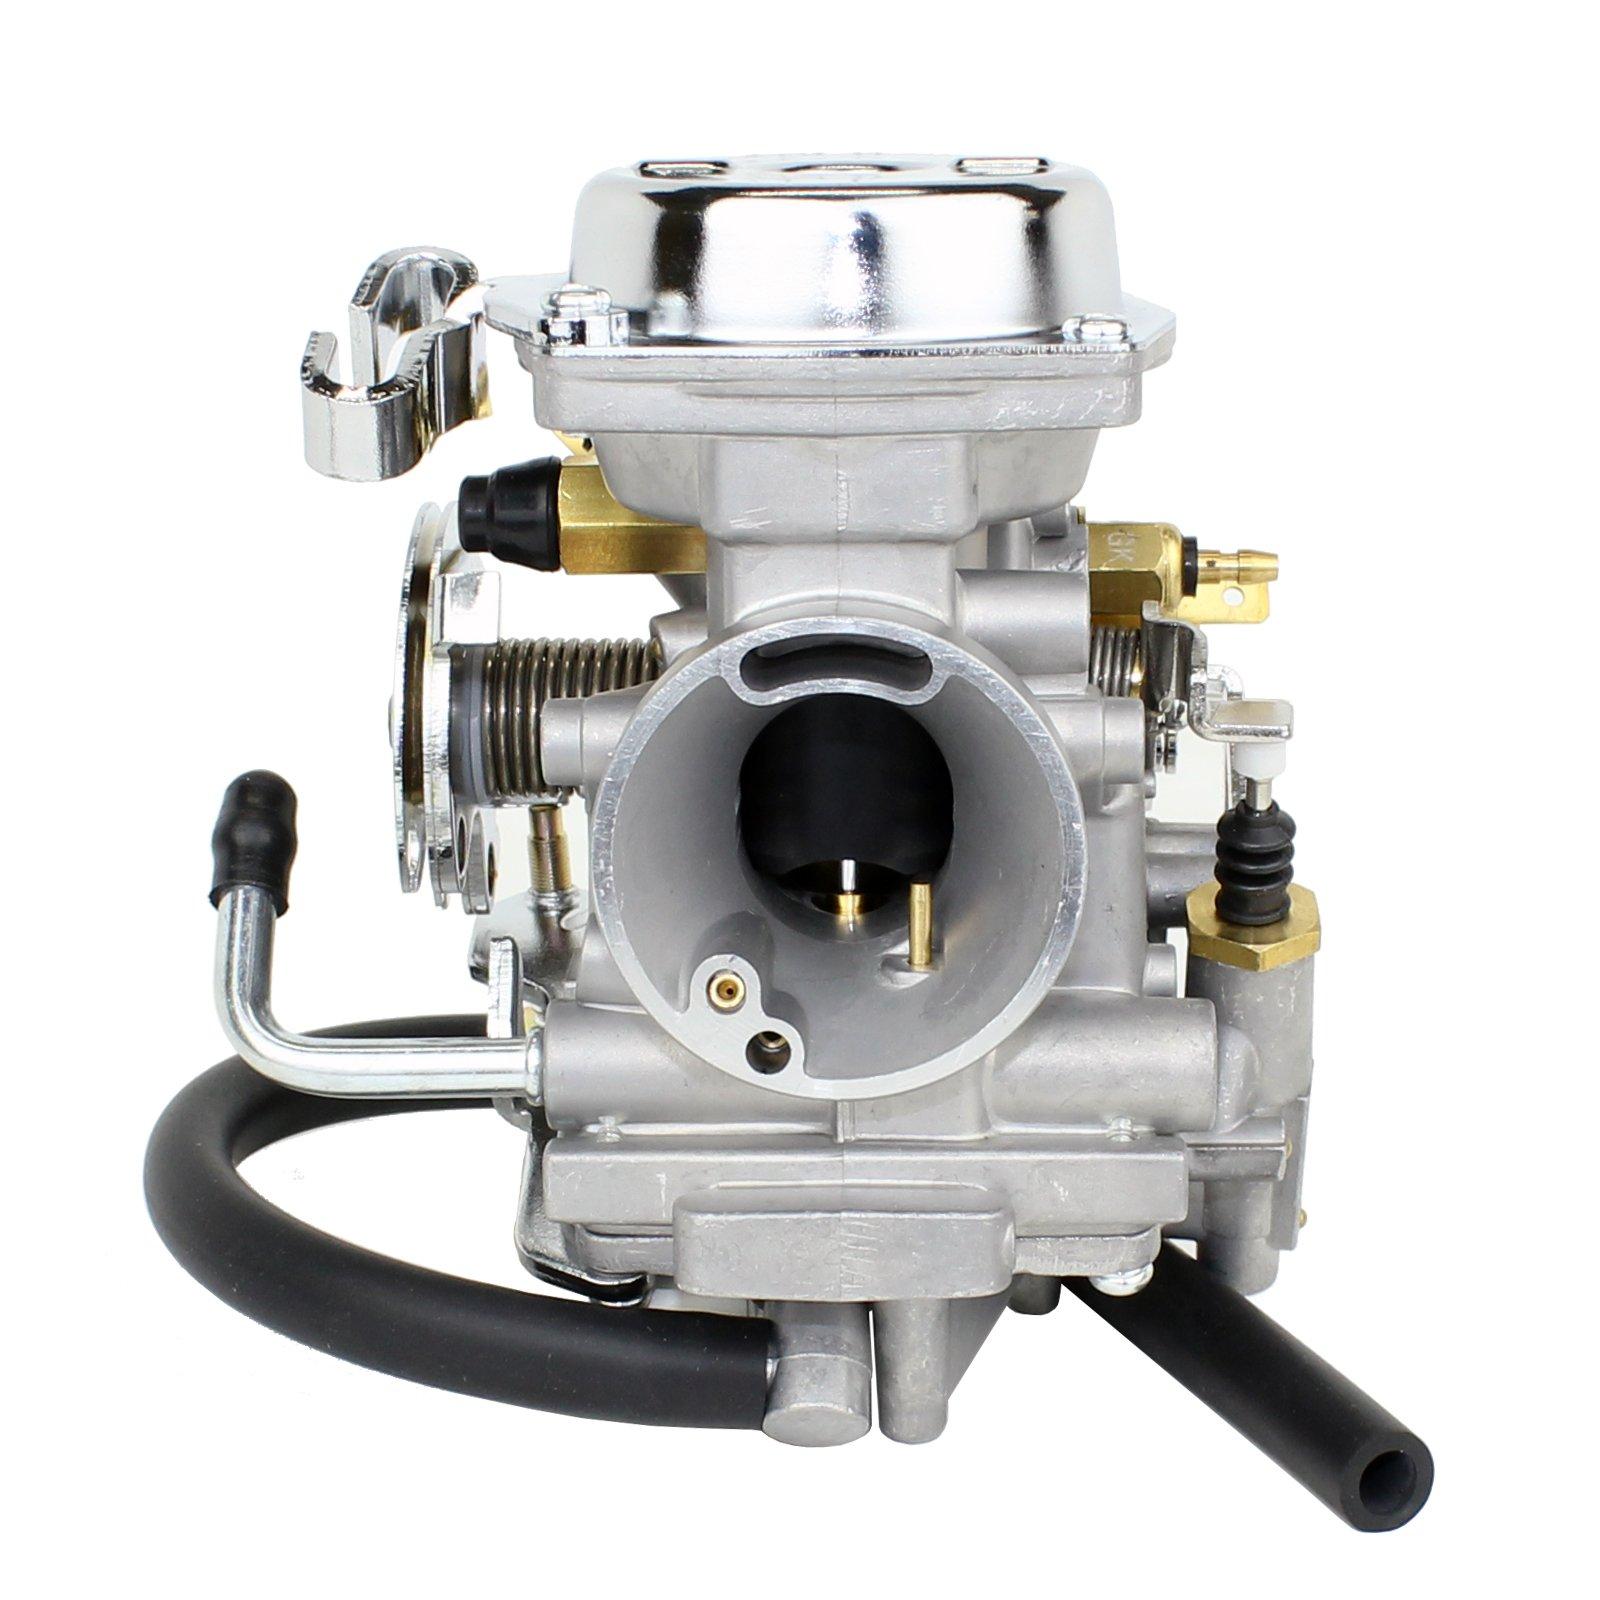 Caltric Carburetor Fits Yamaha Virago 250 Xv250 Xv Fuel Filter 1995 1996 1997 1998 1999 2007 Automotive